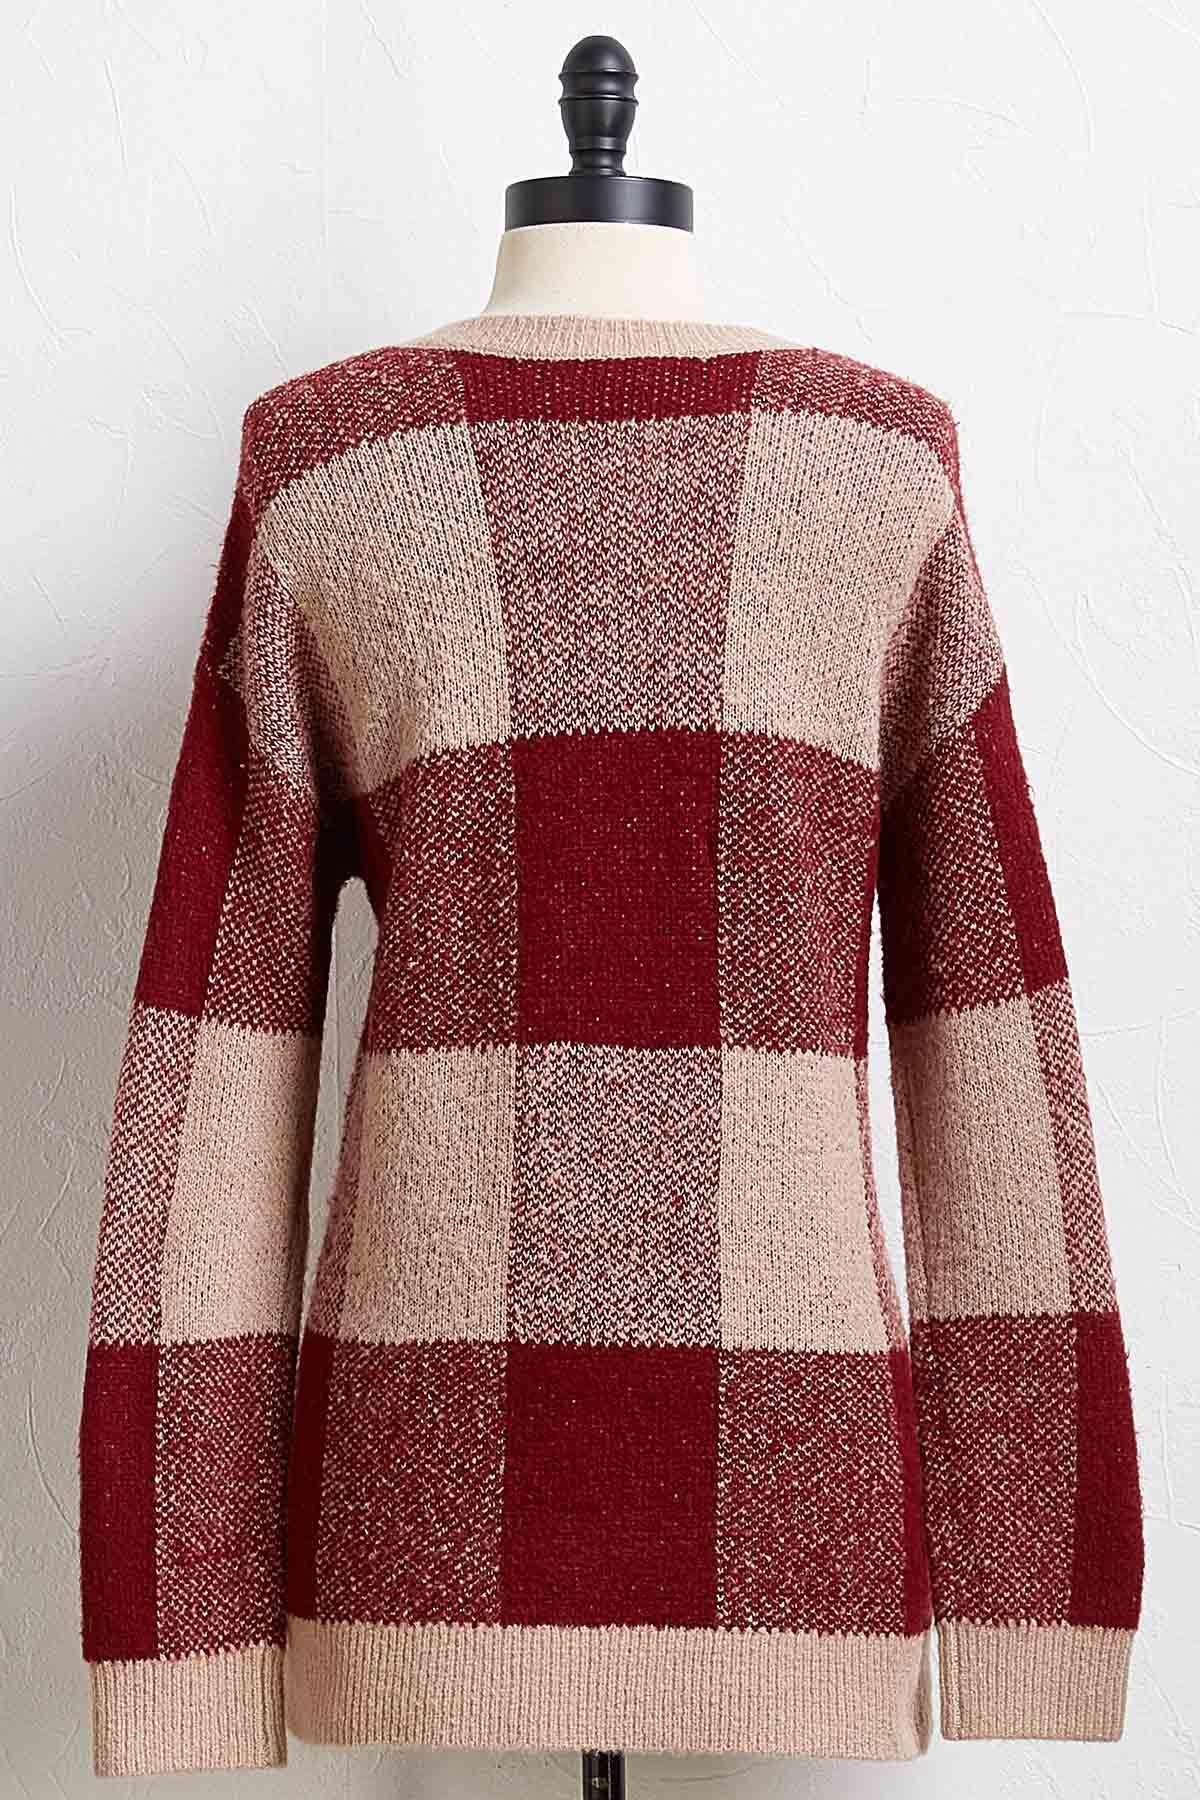 Wine Plaid Sweater